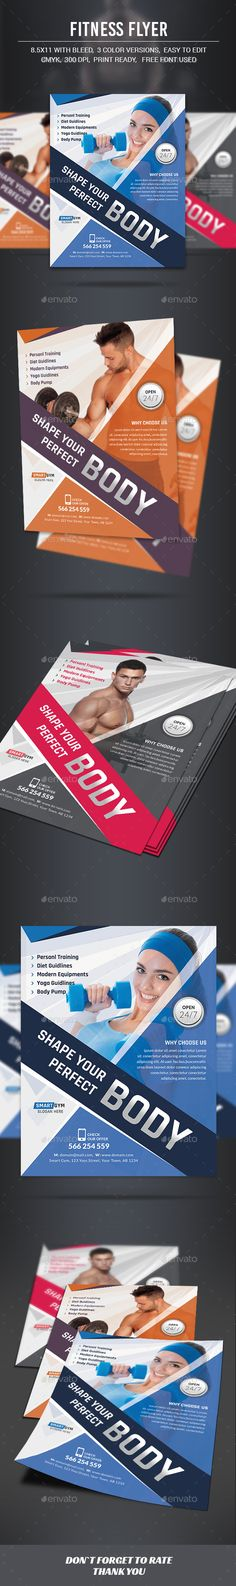 Fitness Flyer Template PSD #design Download: http://graphicriver.net/item/fitness-flyer/13164190?ref=ksioks